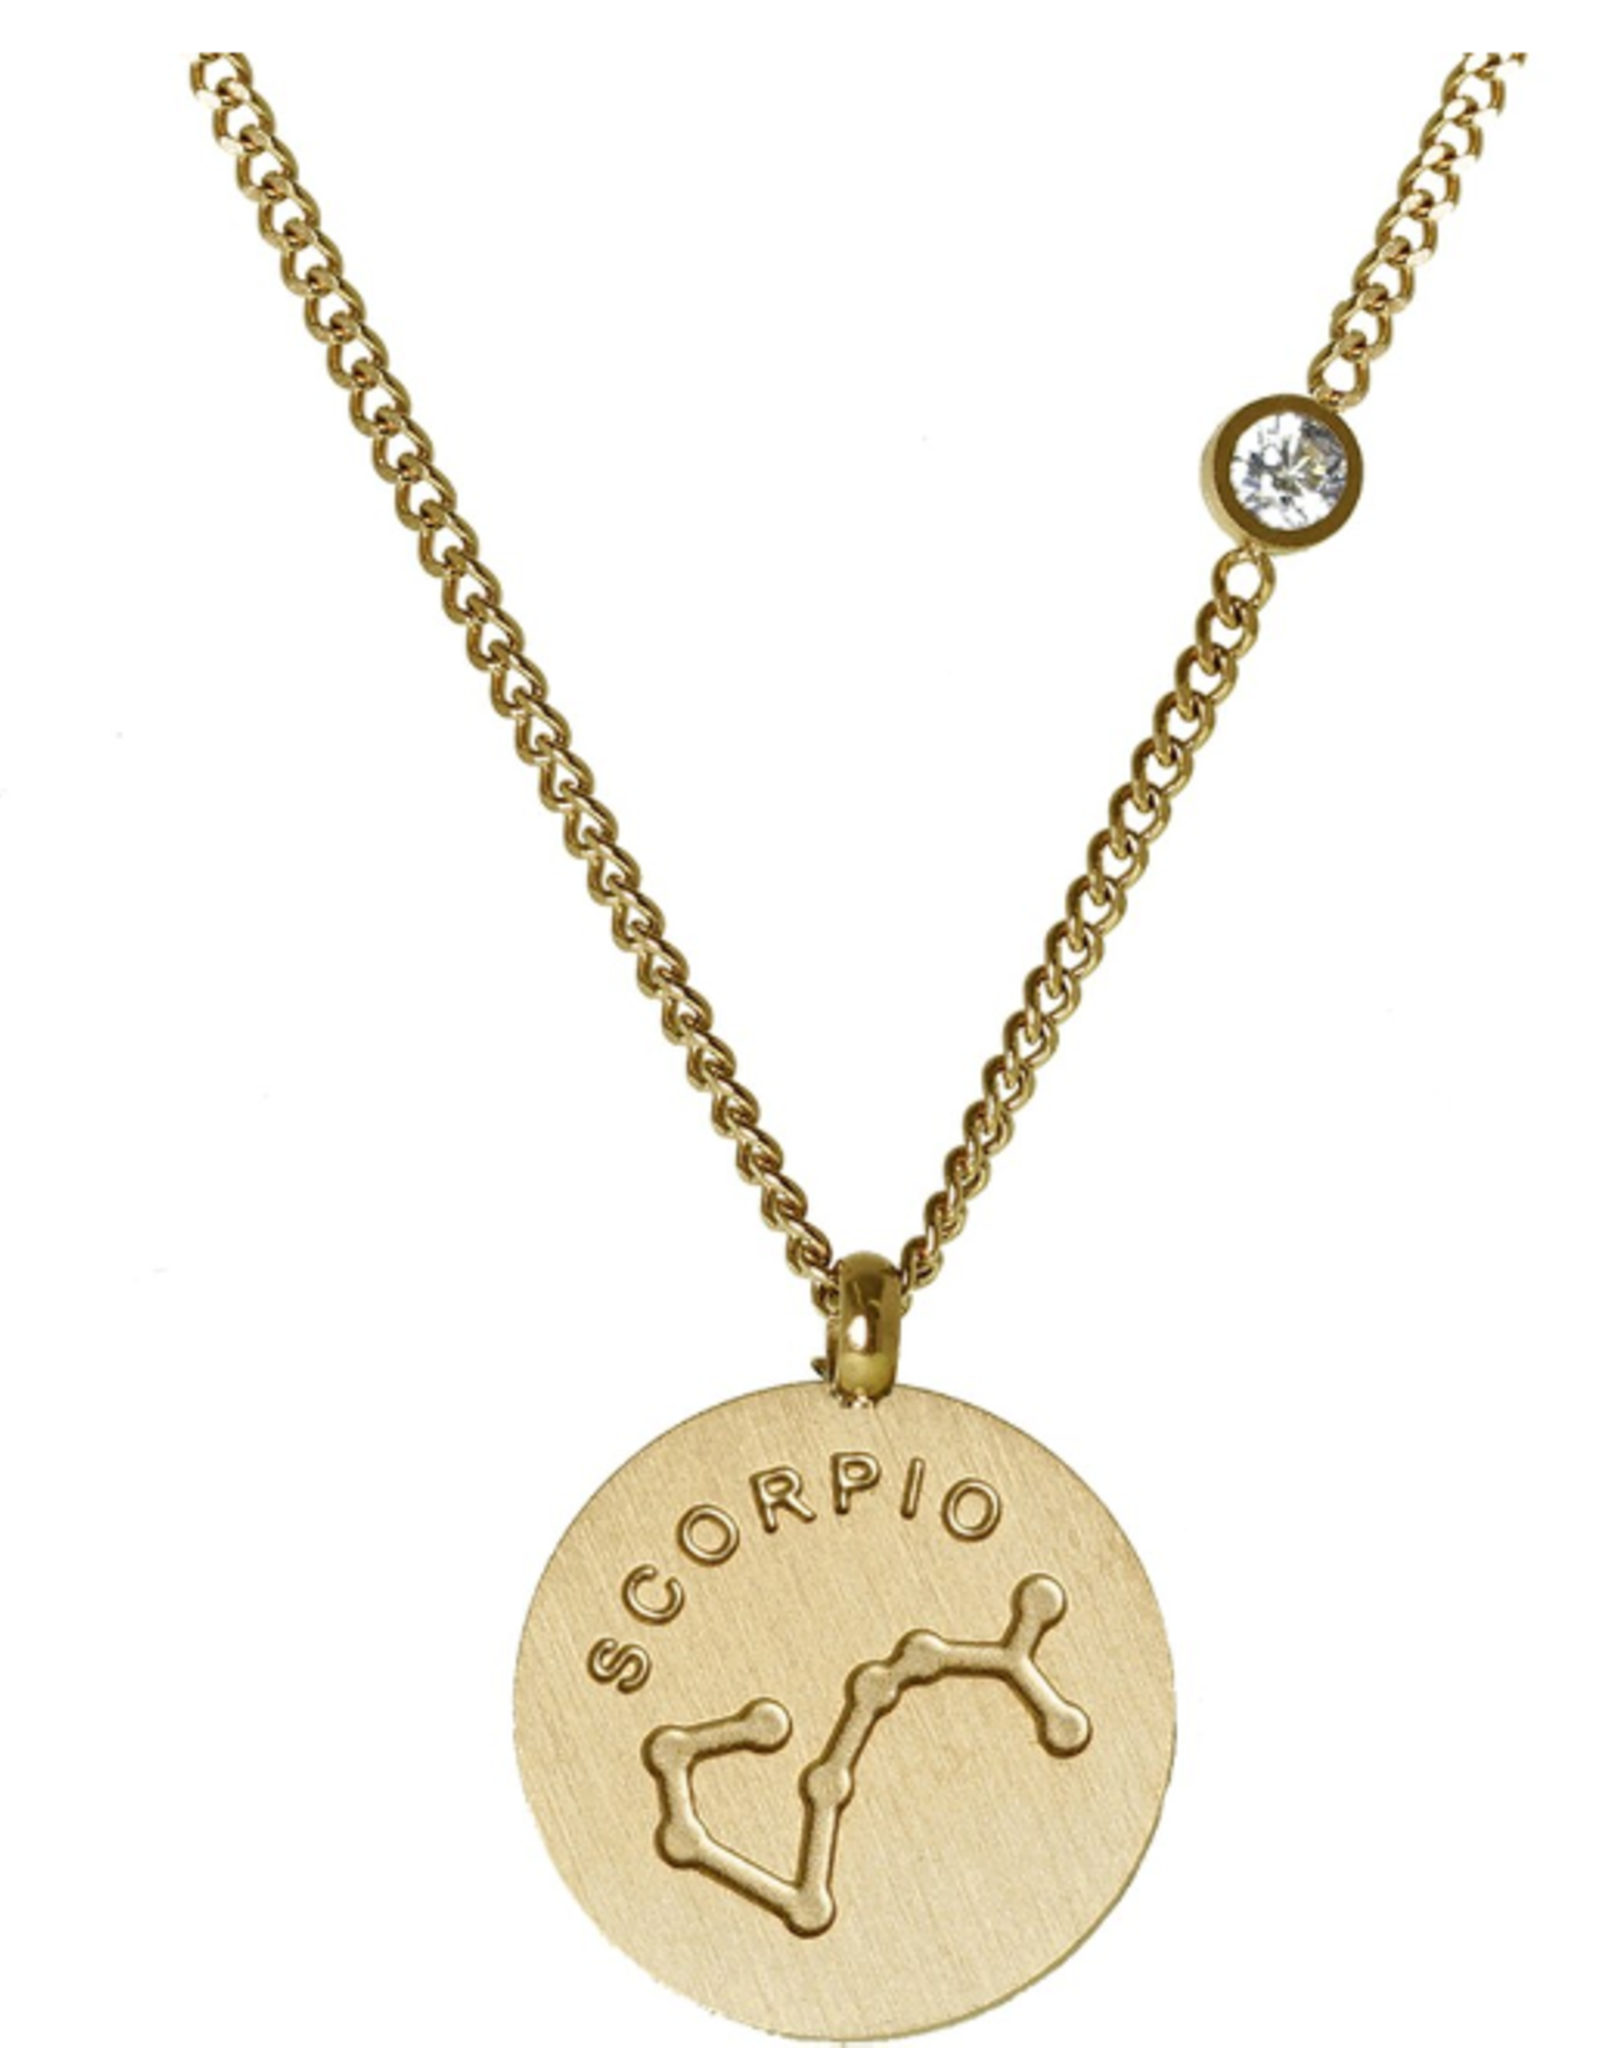 Gold Scorpio Necklace